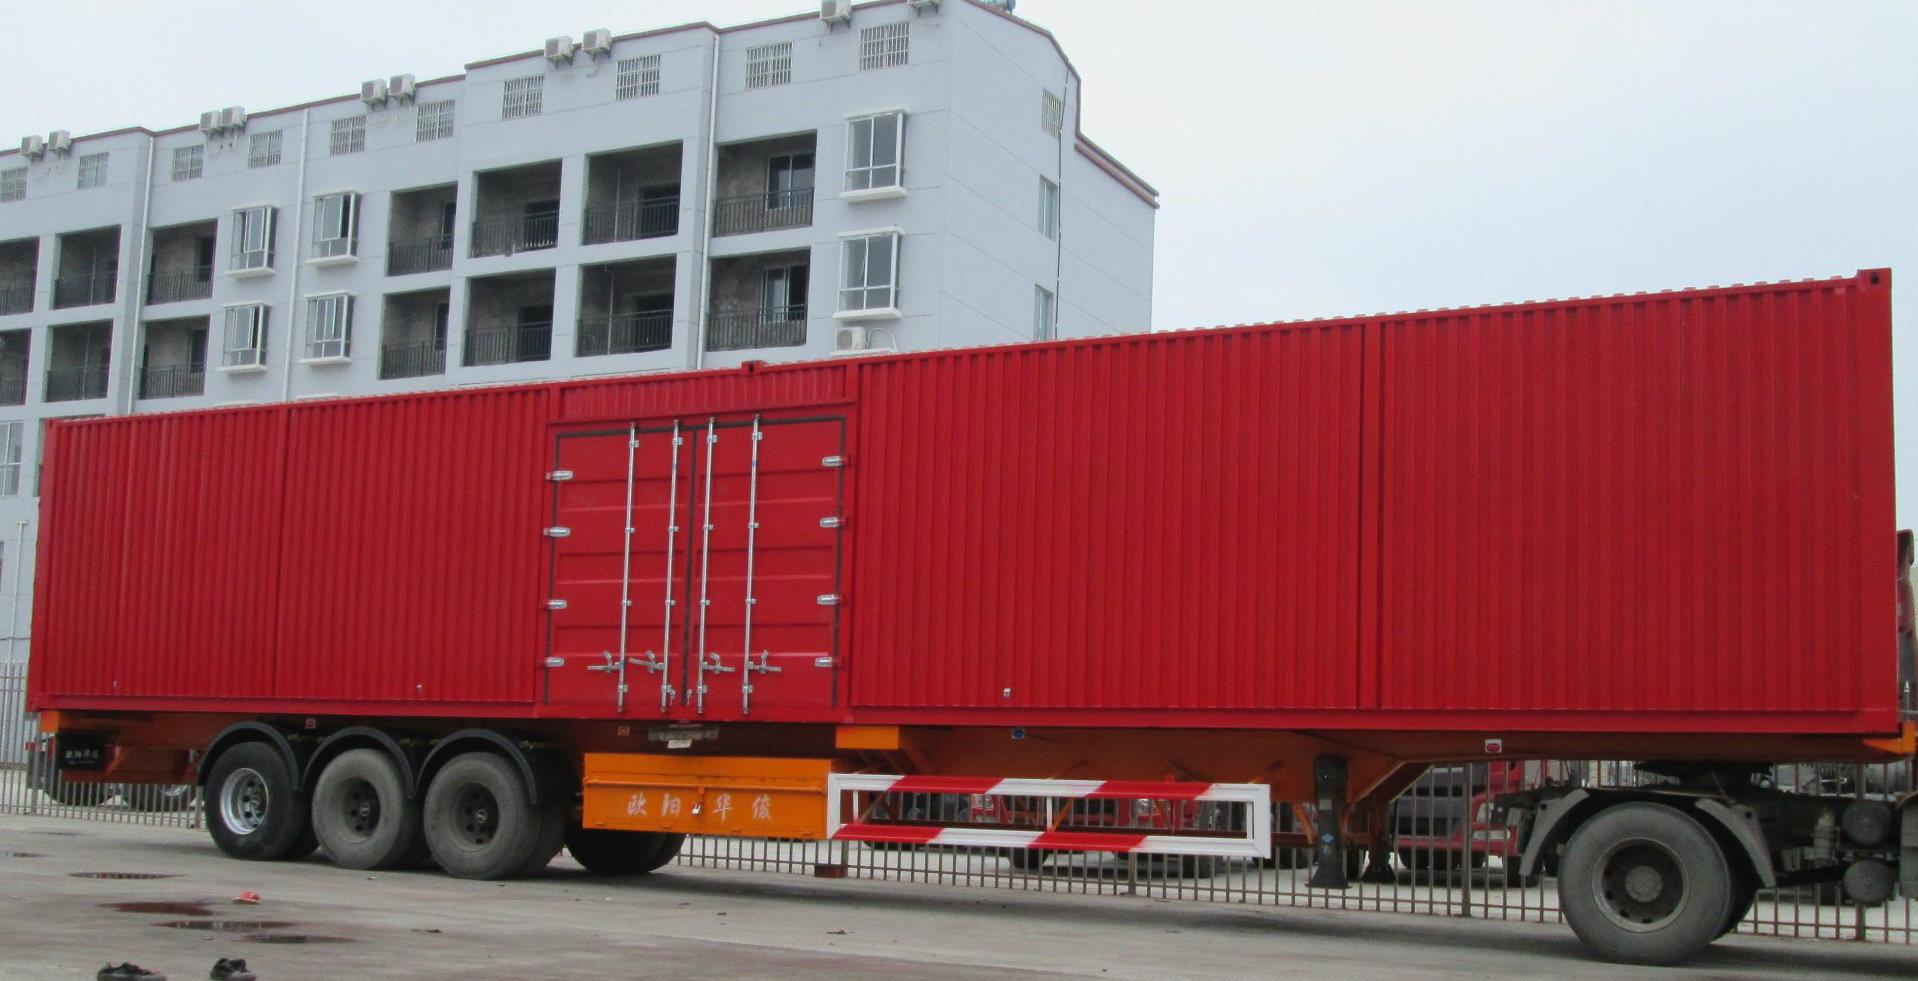 53 Feet Container Semitrailer